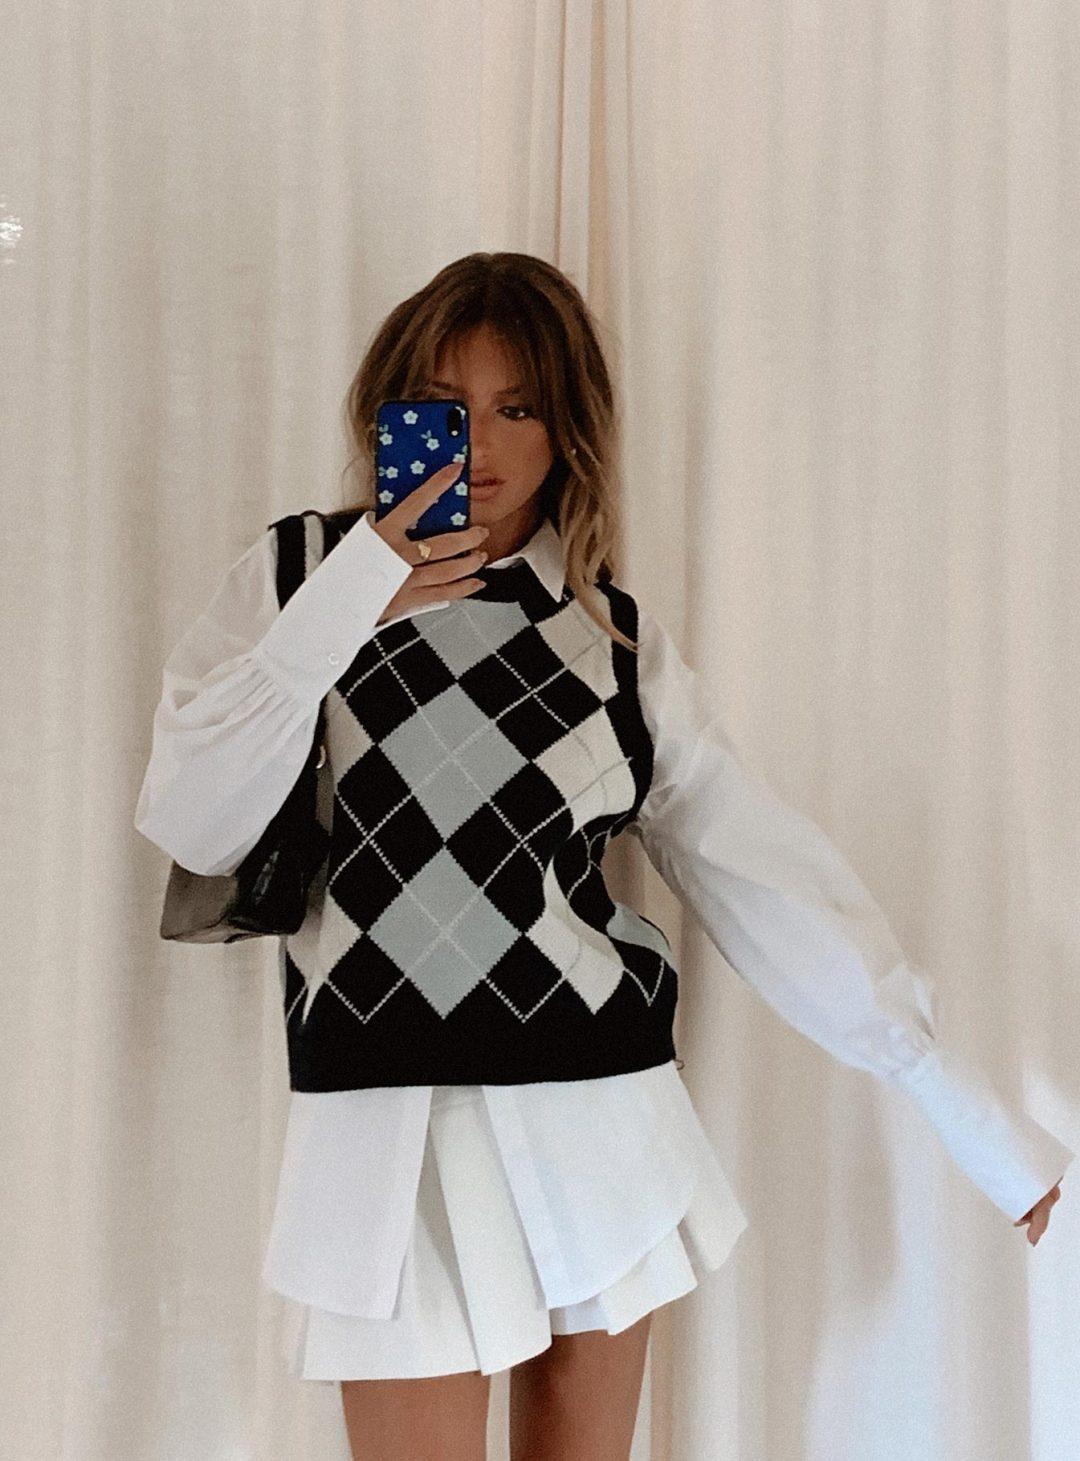 Dark blue argyle print sweater vest outfit